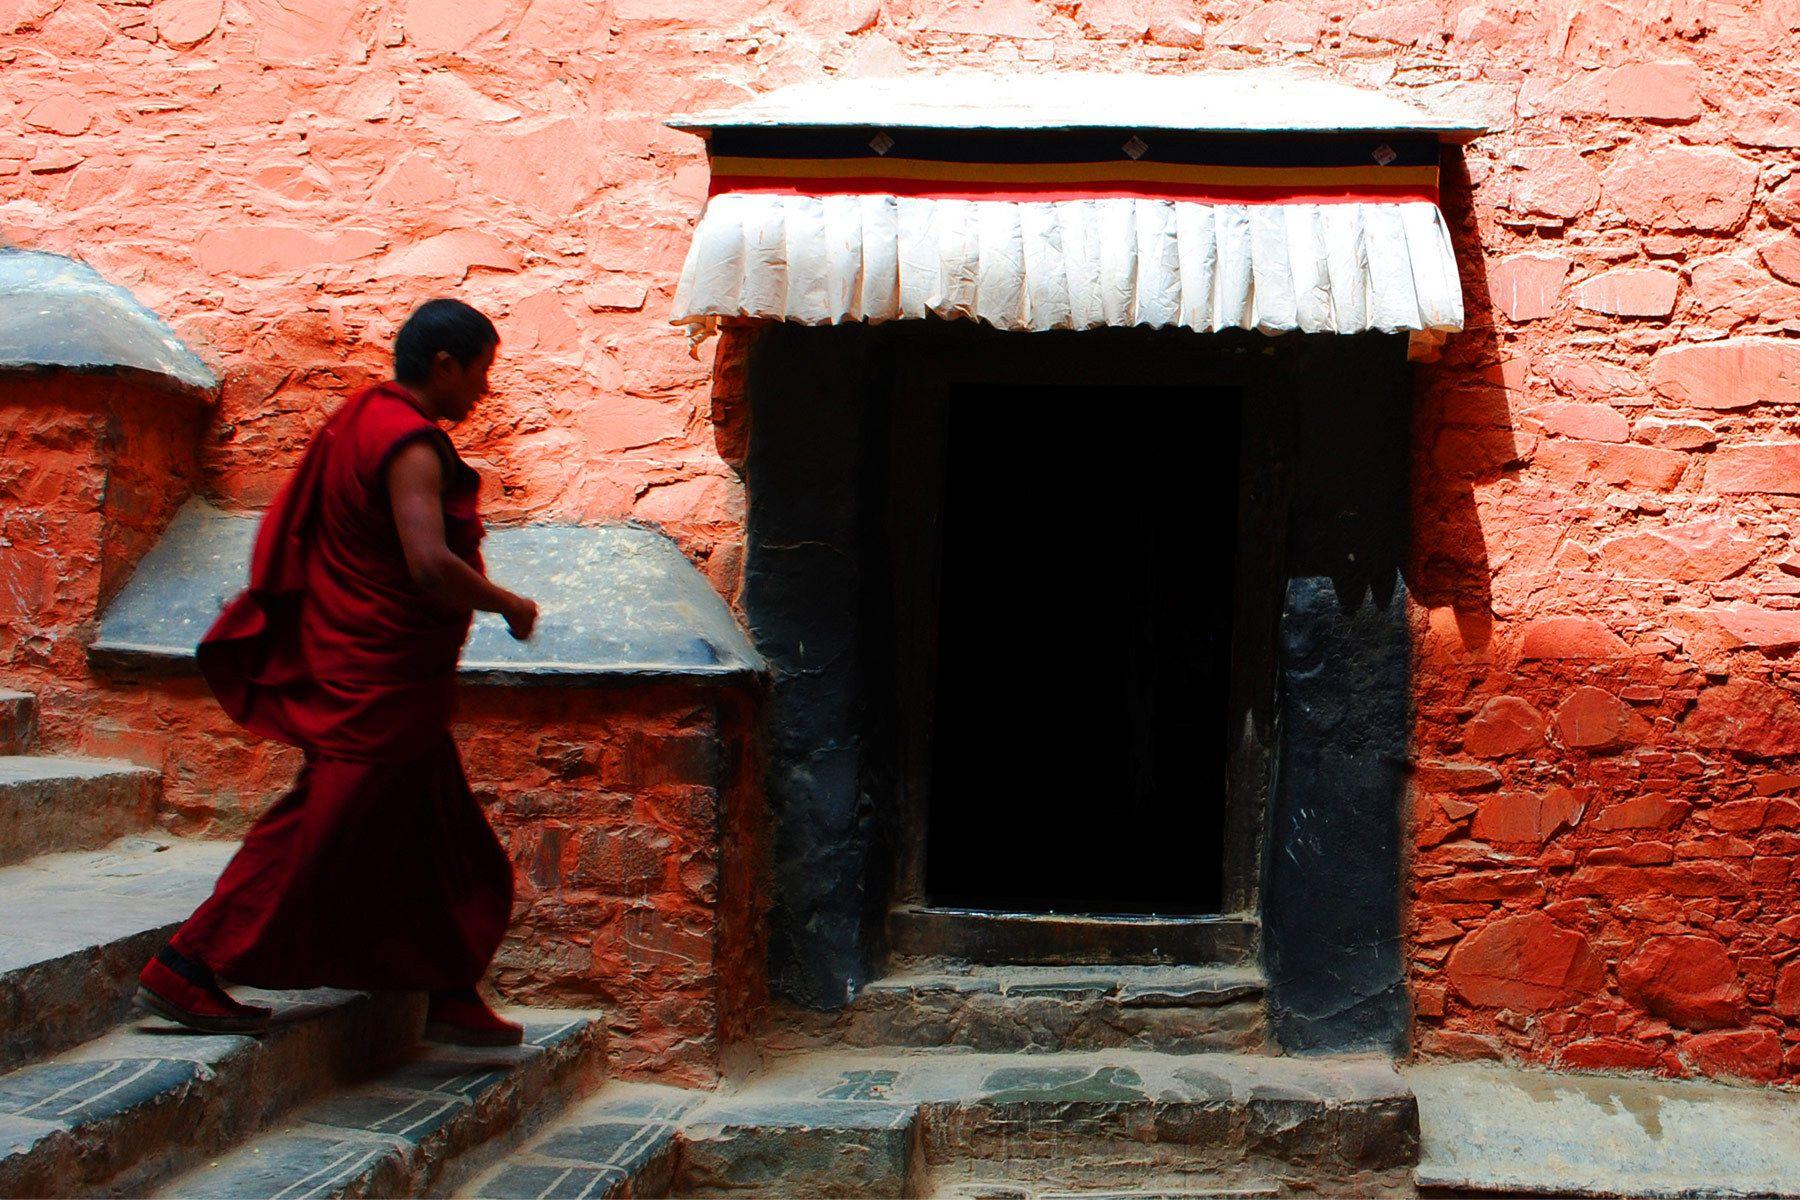 102___tibet_monk_buddhist_buddhism_budista_monje.jpg